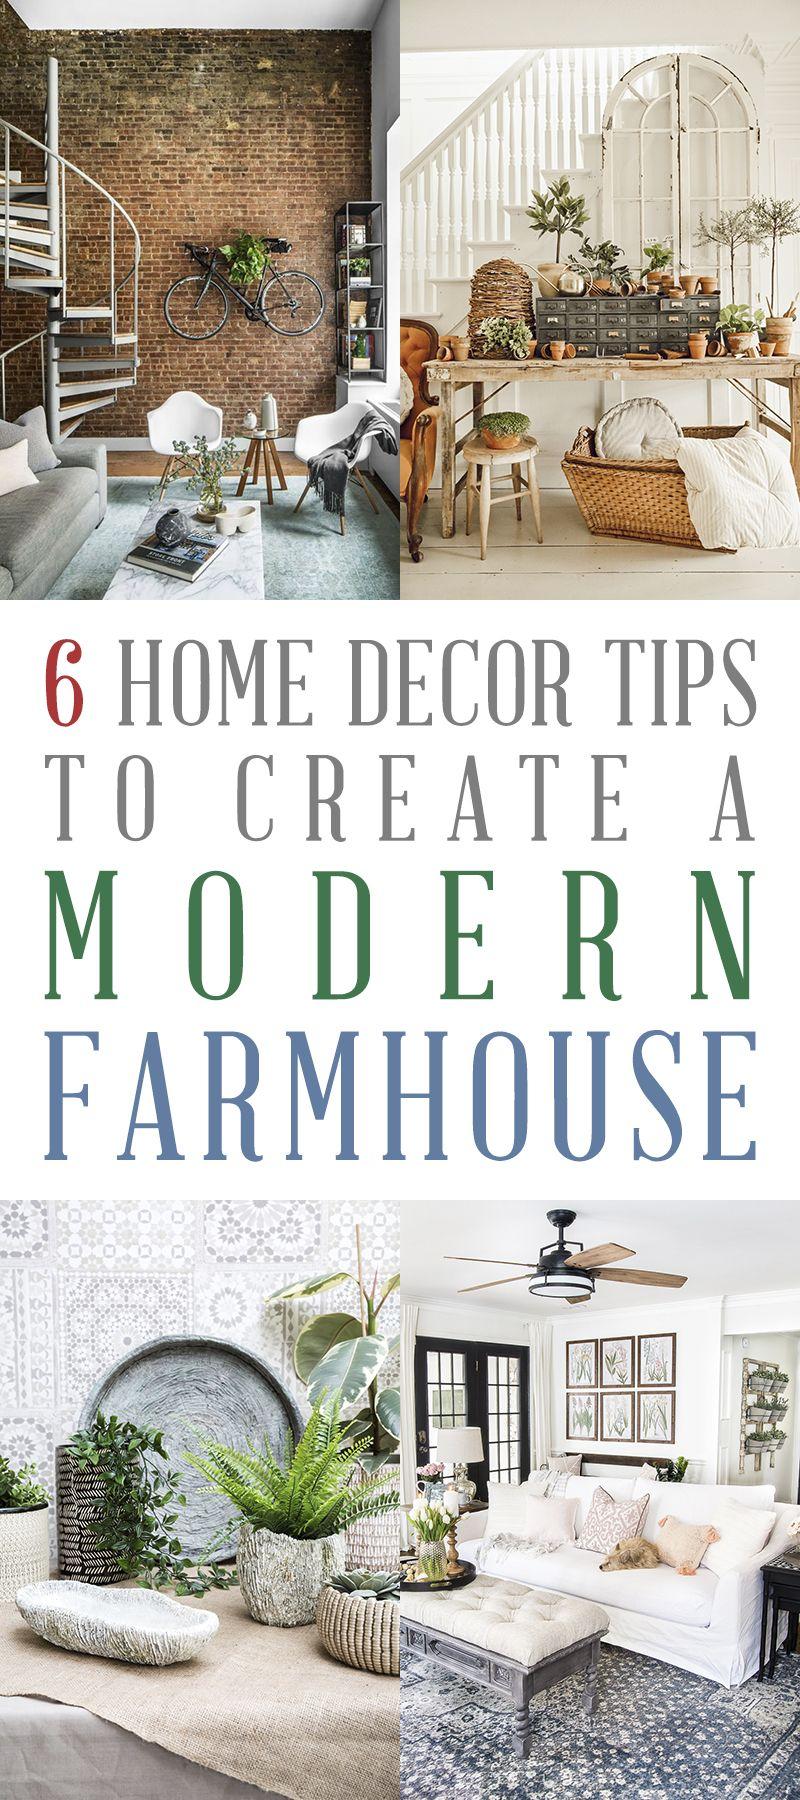 6 Home Decor Tips to Create a Modern Farmhouse - The Cottage Market